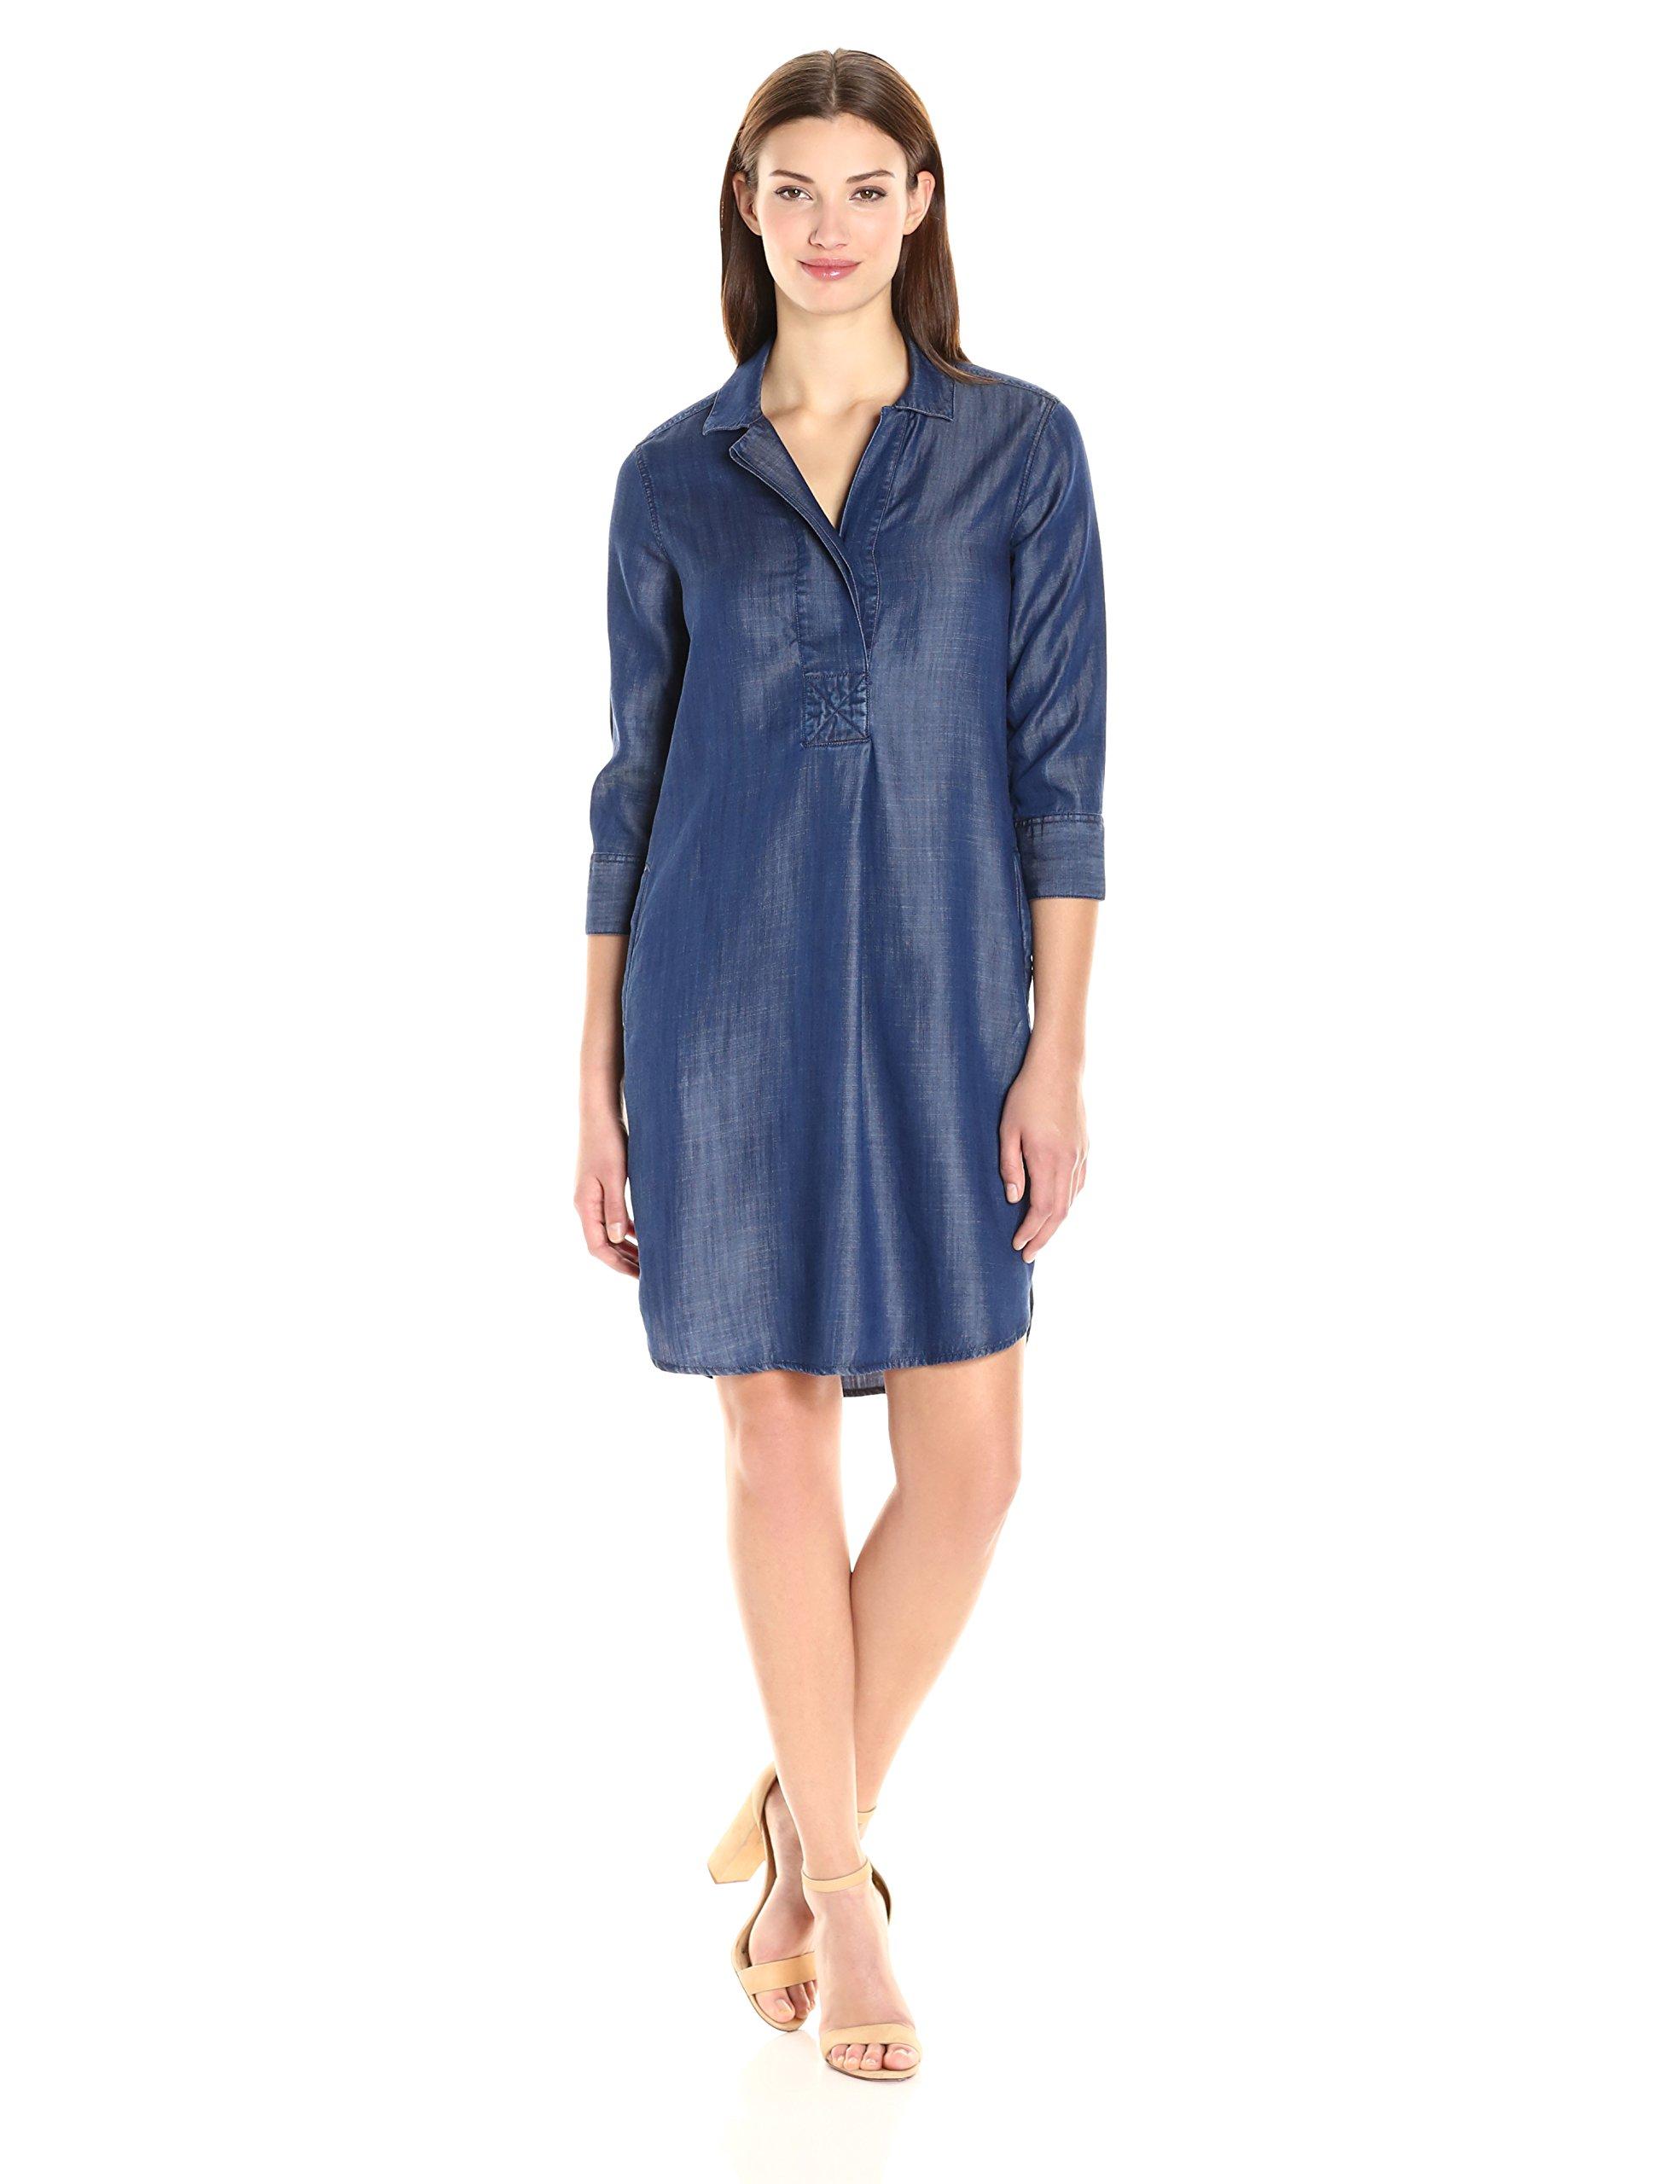 Foxcroft Women's 3/4 Sleeve Nikki Denim Tencel Dress, Navy, 8